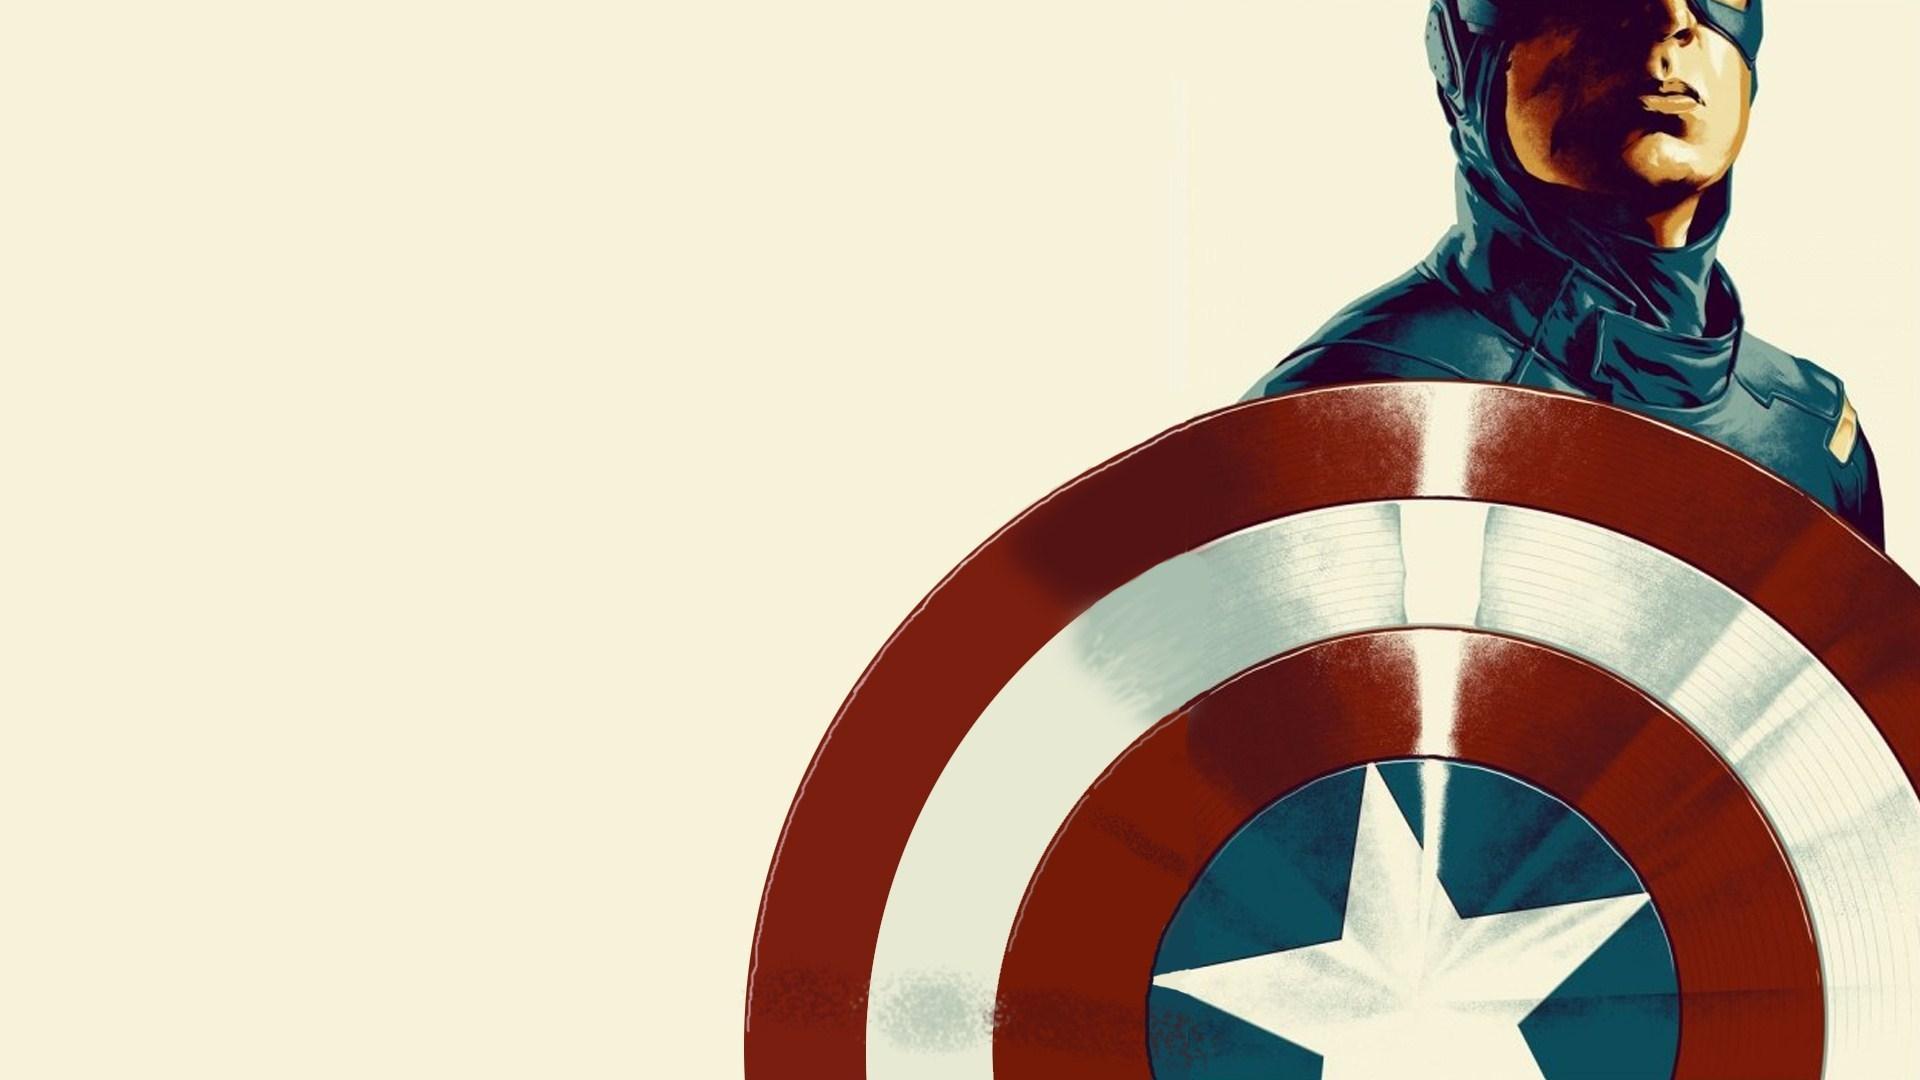 Captain America Computer Wallpapers Wallpaper Cave